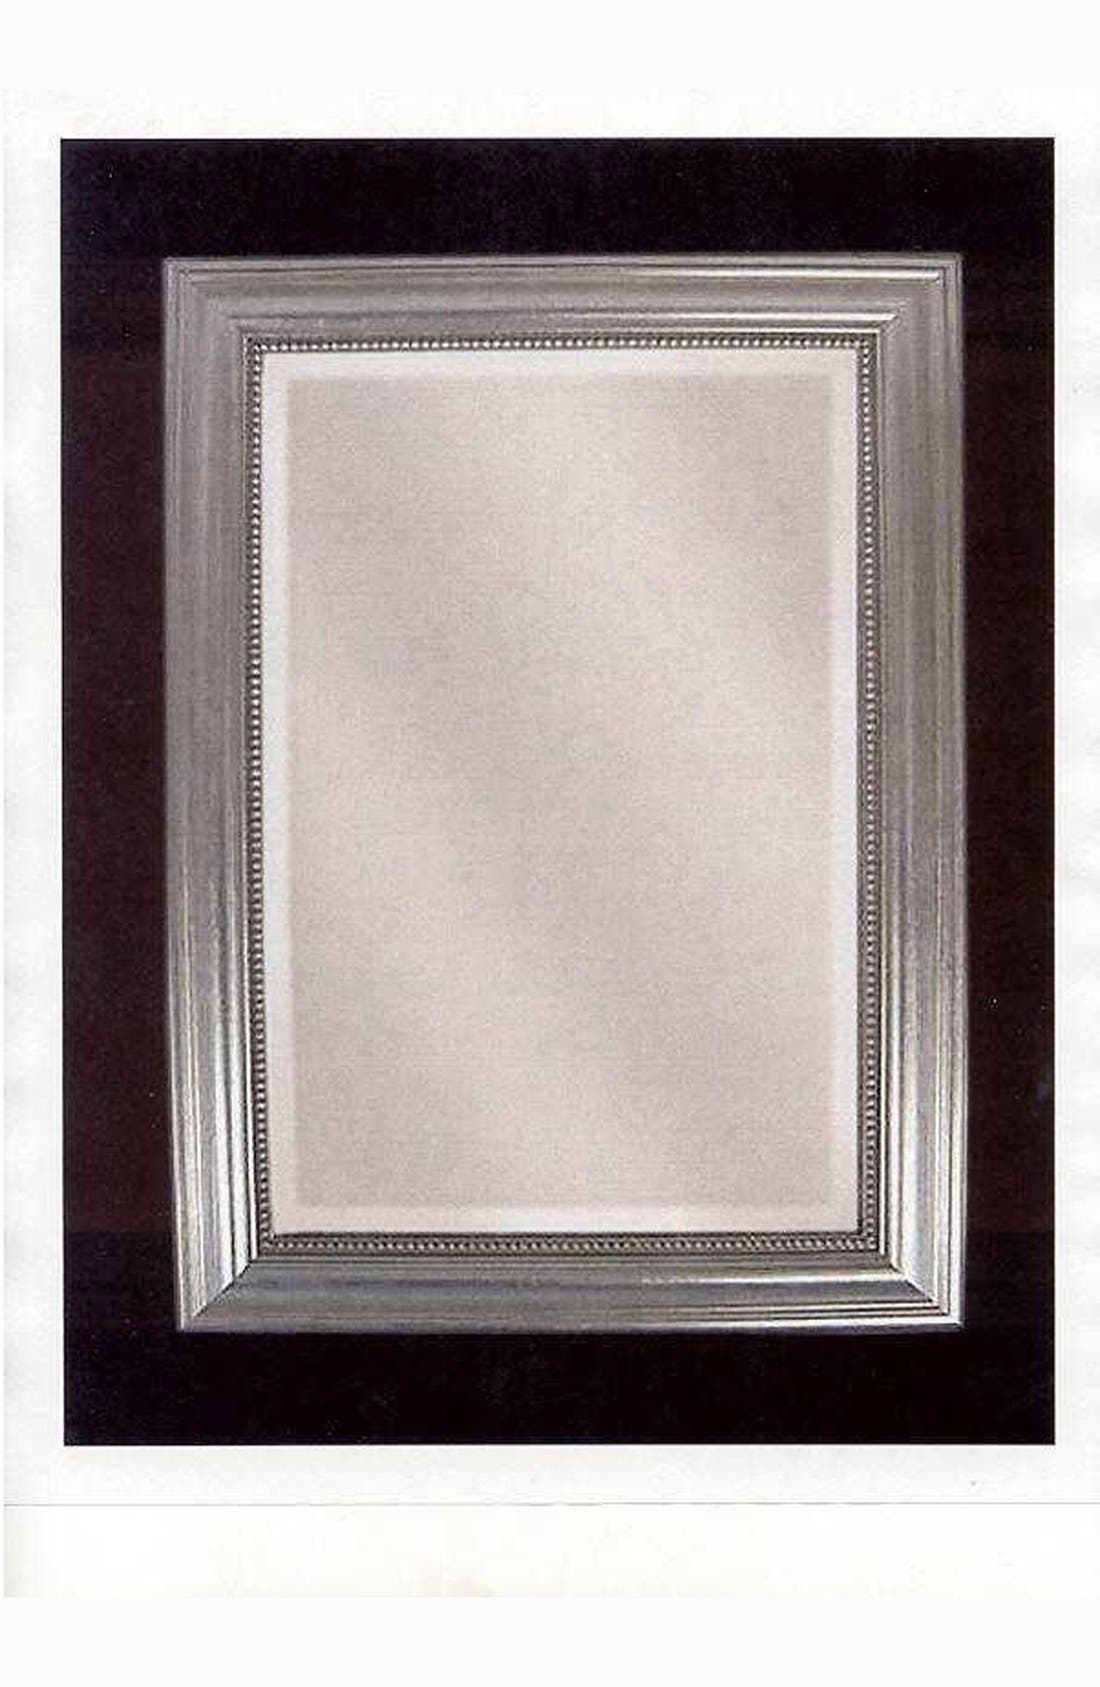 Main Image - Uttermost 'Stuart' Silver Beaded Mirror